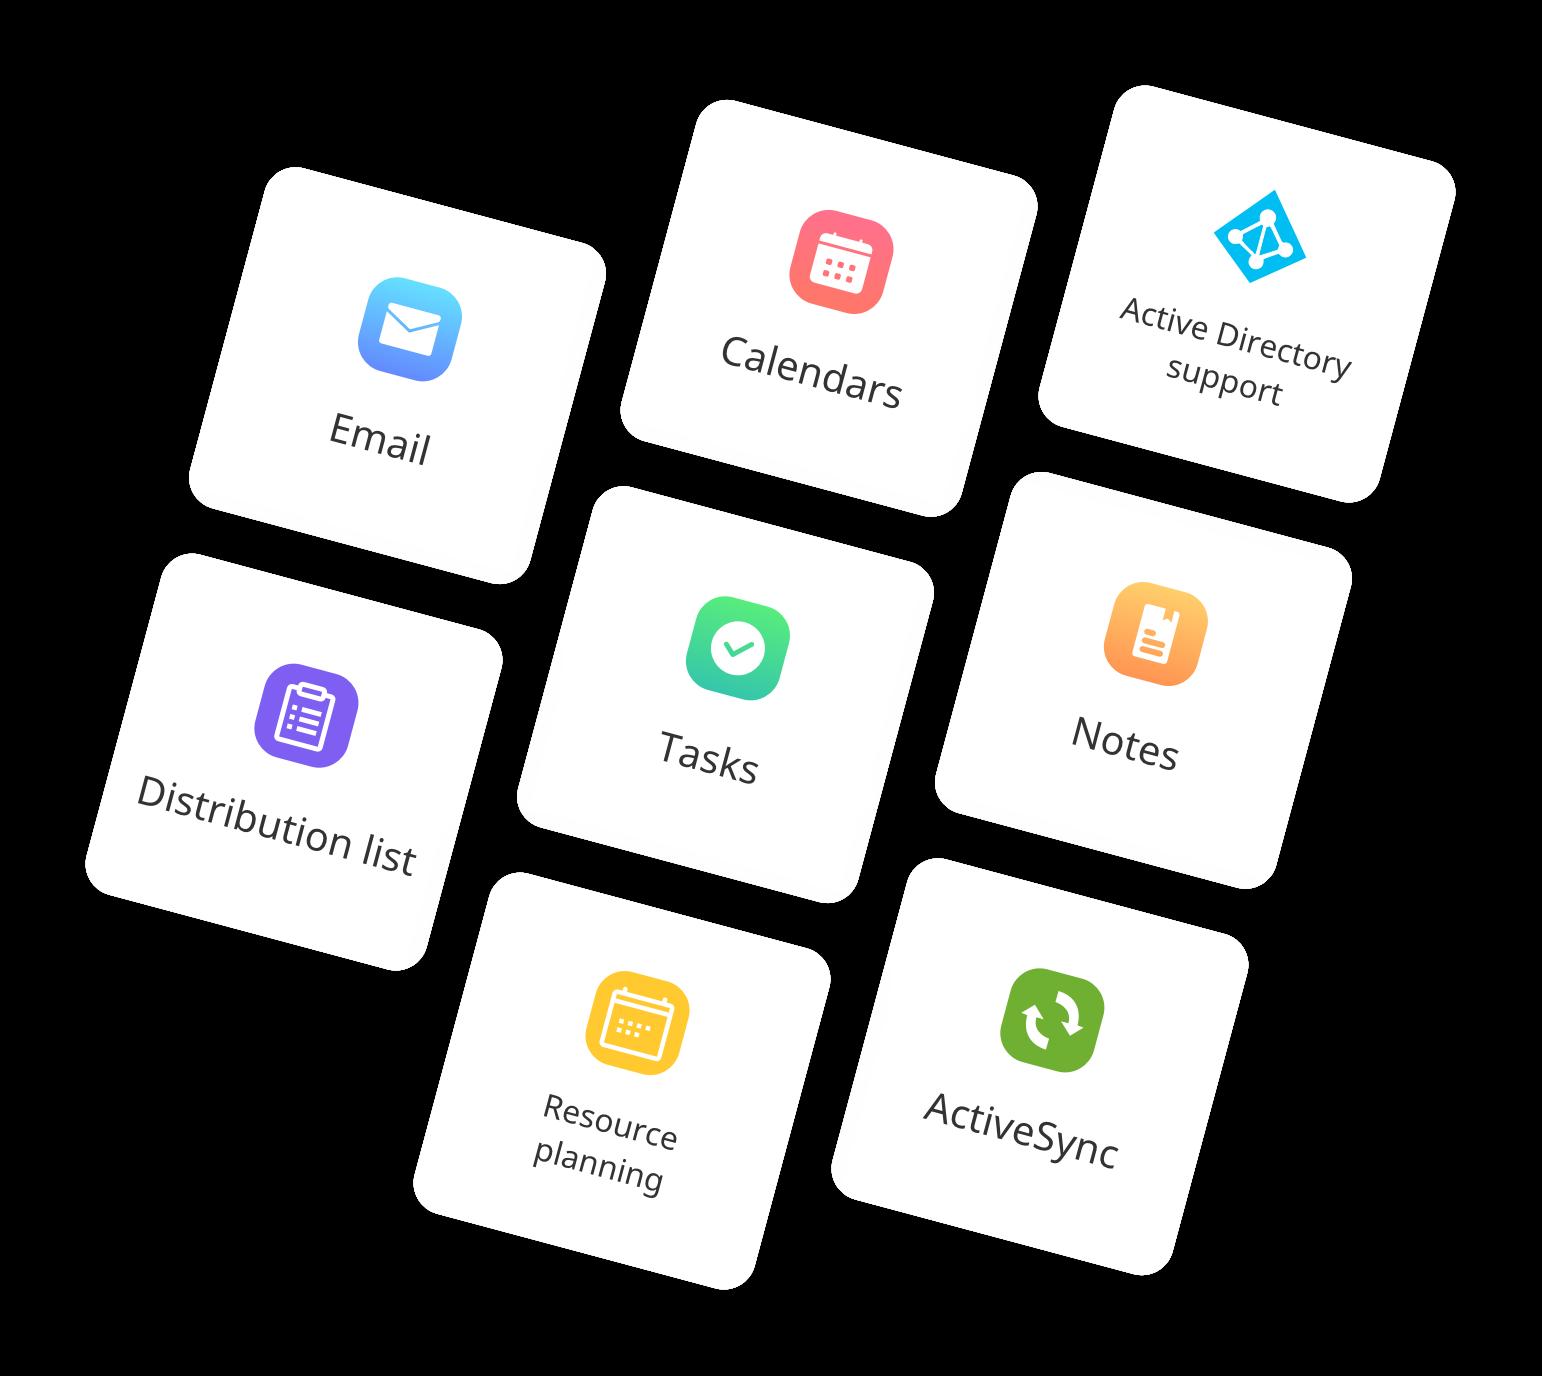 Uma alternativa ao Office 365, Zimbra, G-suíte.